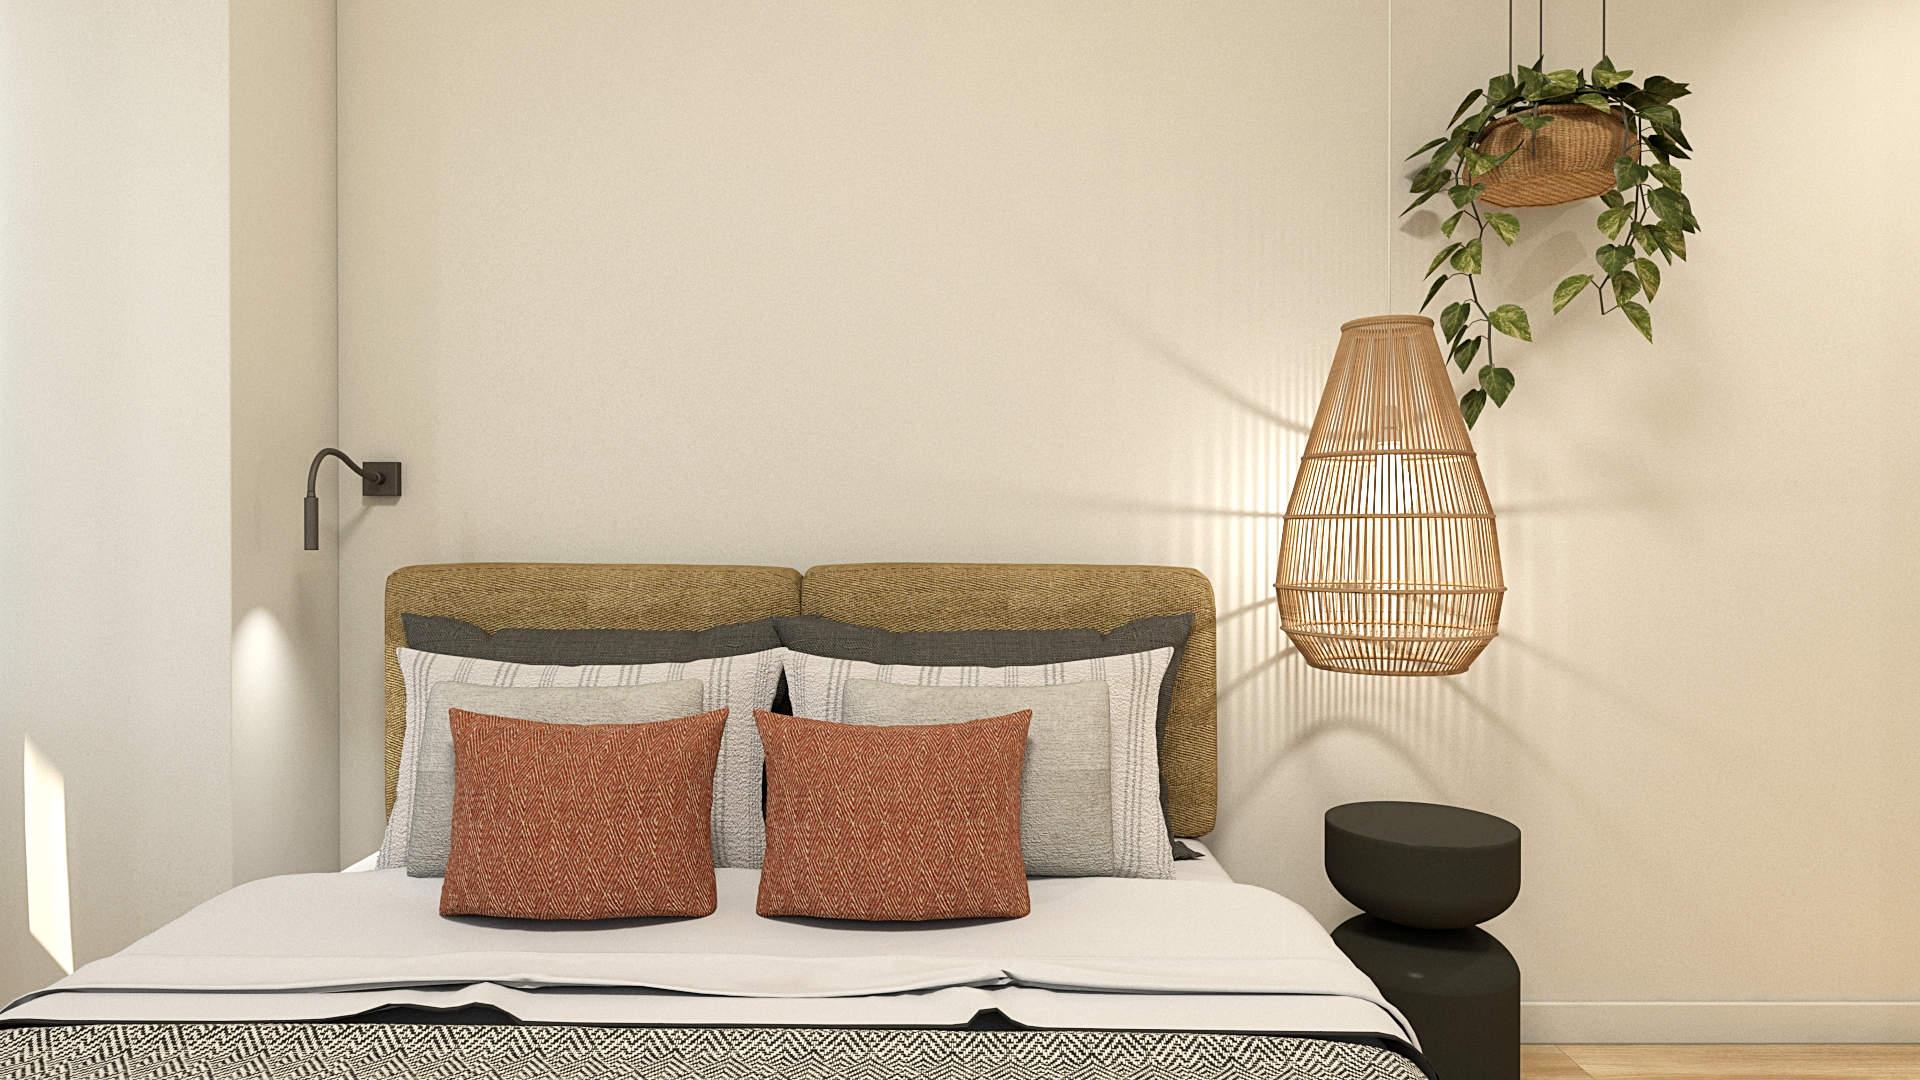 apartment renovation, interior design, bedroom . Μερική αναδιαμόρφωση κατοικίας, διακόσμηση, υπνοδωμάτιο.